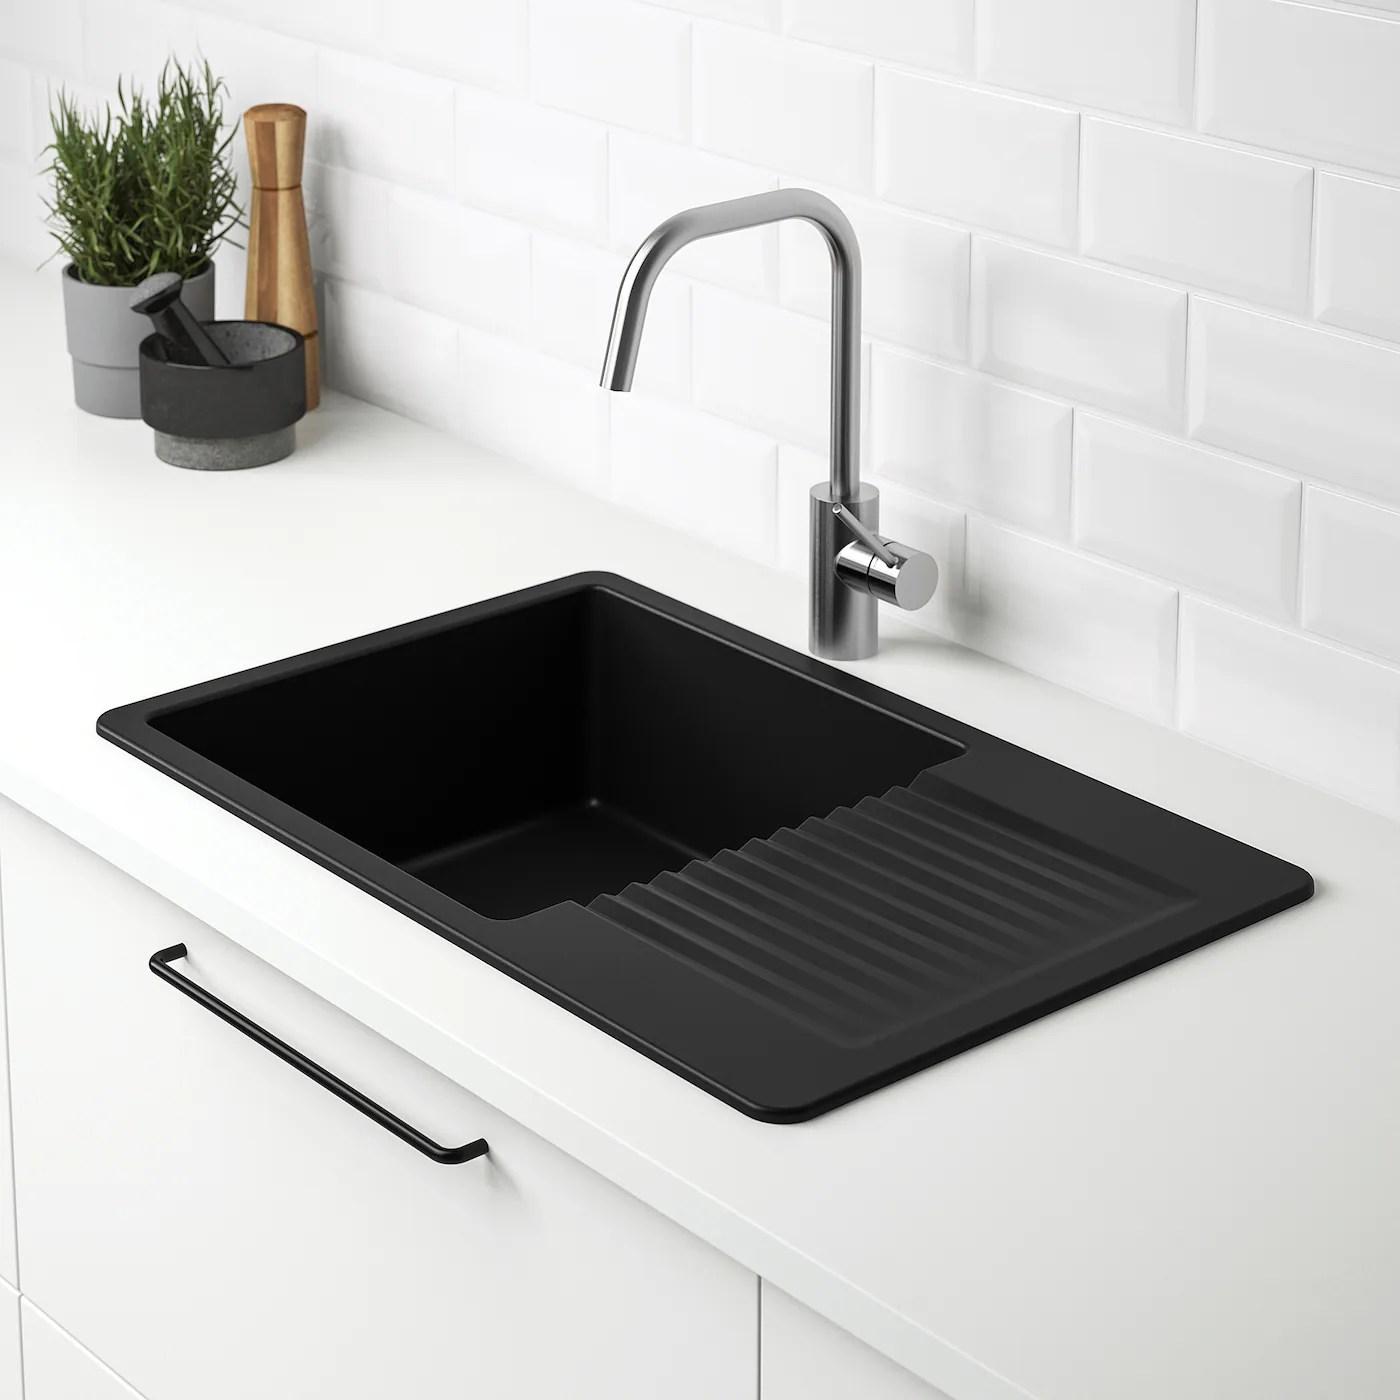 Kilsviken Inset Sink 1 Bowl With Drainboard Black Quartz Composite Ikea